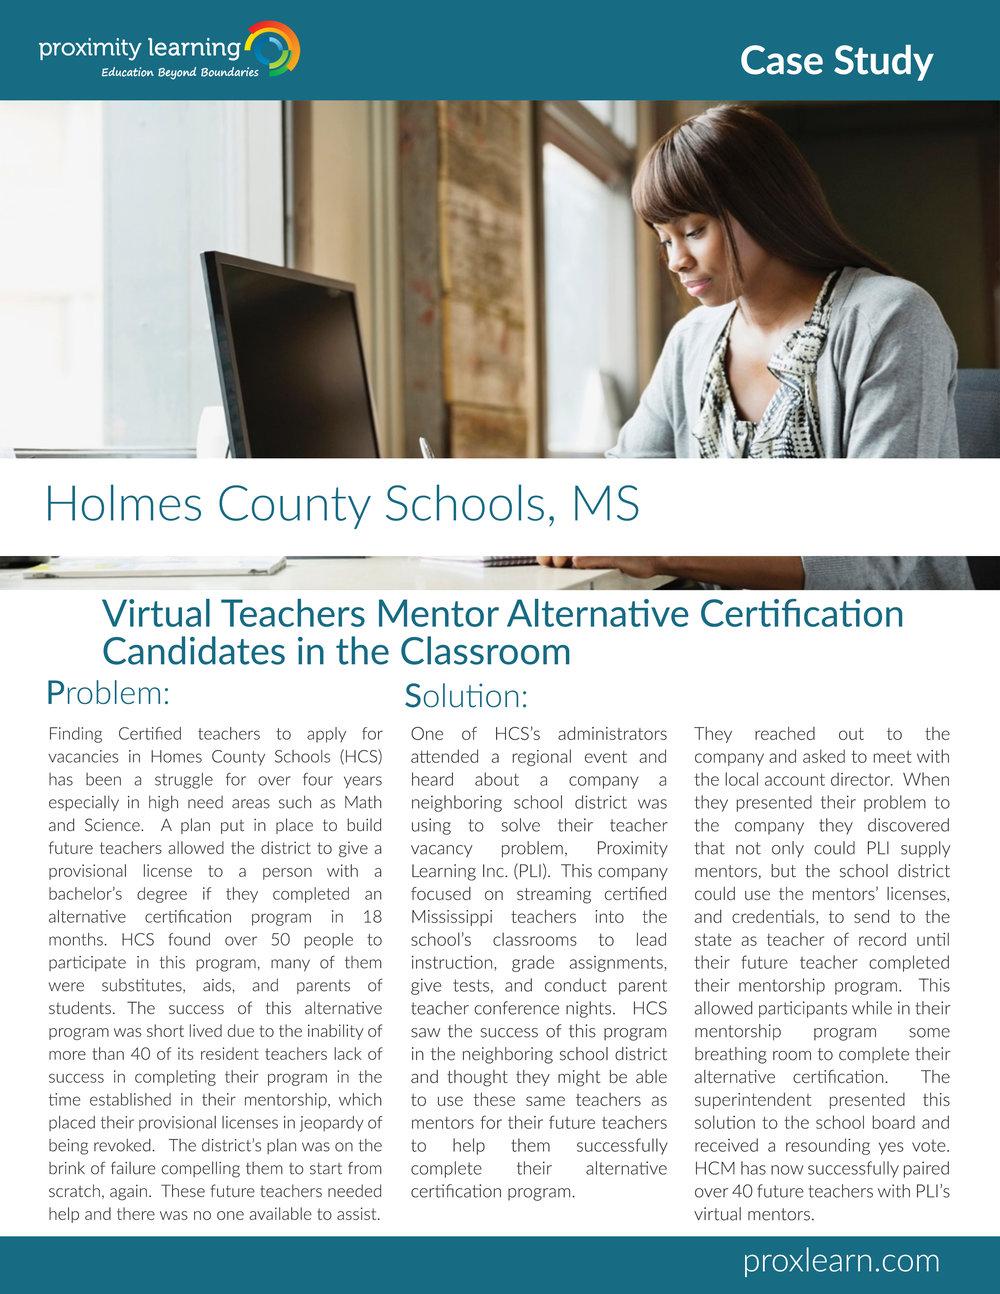 Holmes County Schools Case Study.jpg